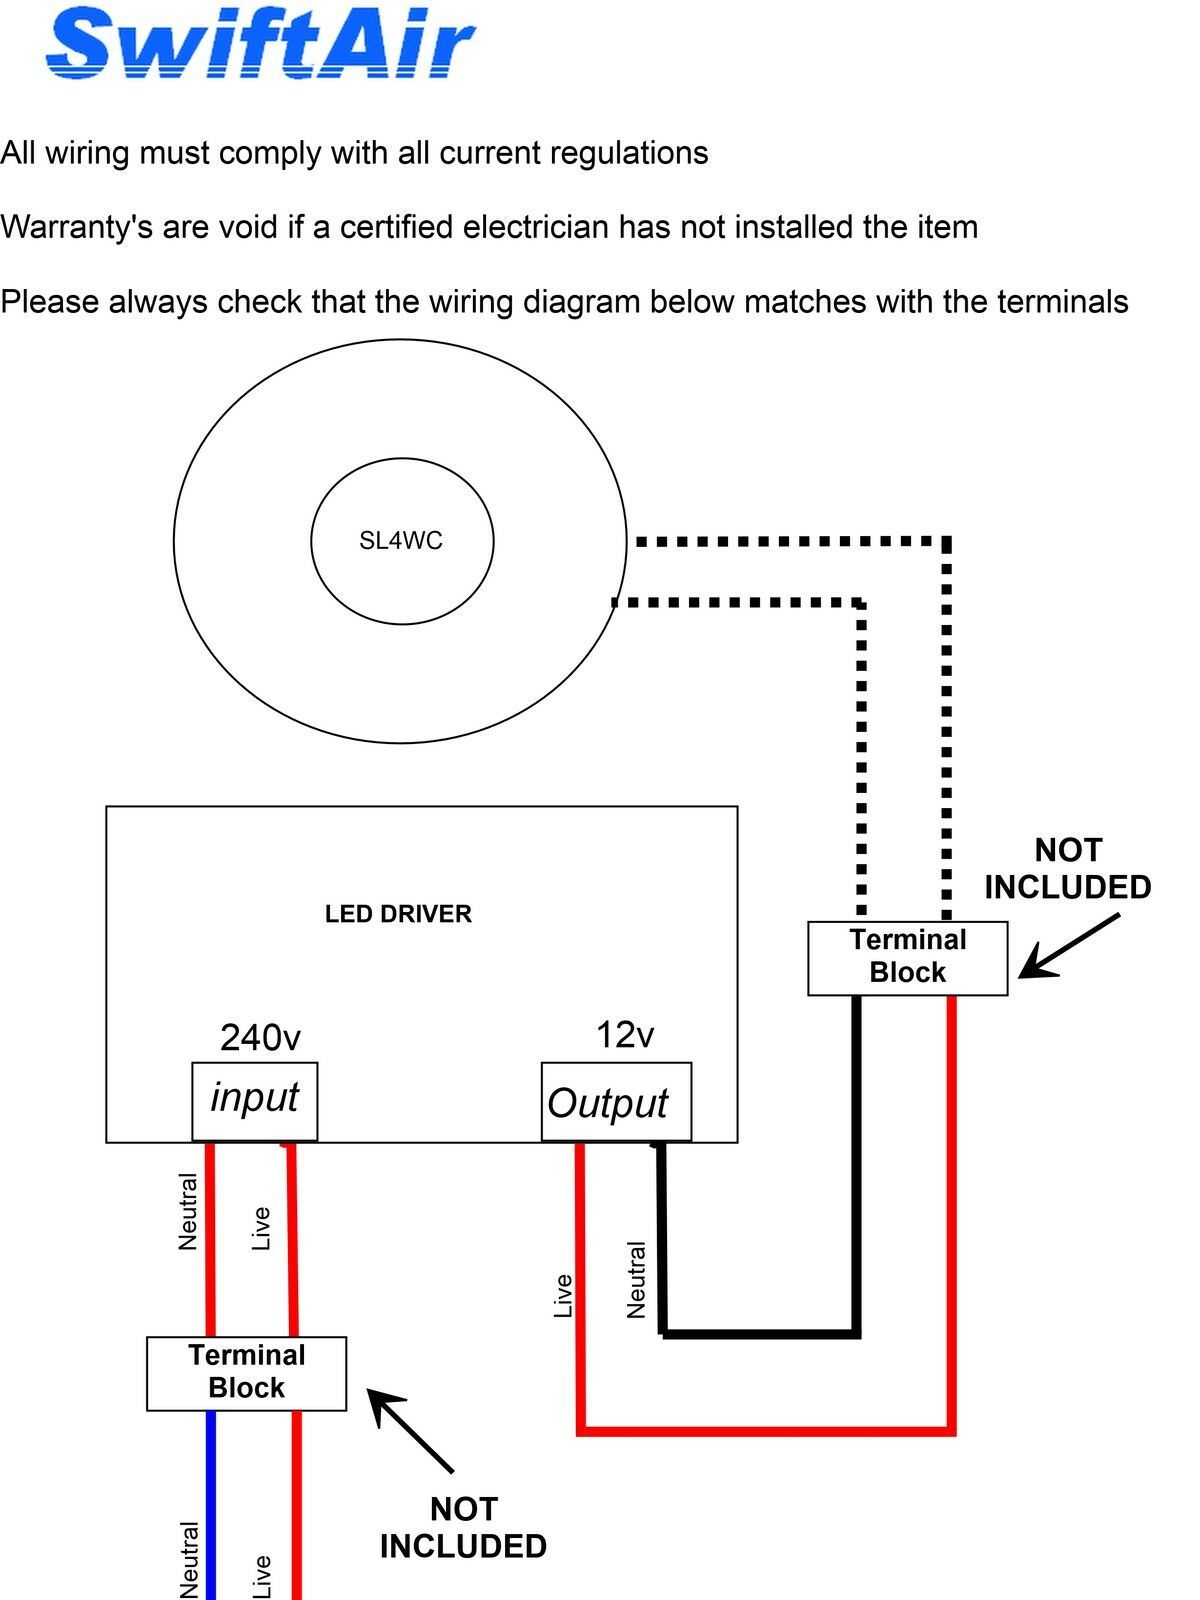 SY_2297] Wiring Diagram Bathroom Extractor Fan Timer Download Diagram | Bathroom Extractor Fan Wiring Diagram |  | Dylit Ostr Garna Mohammedshrine Librar Wiring 101